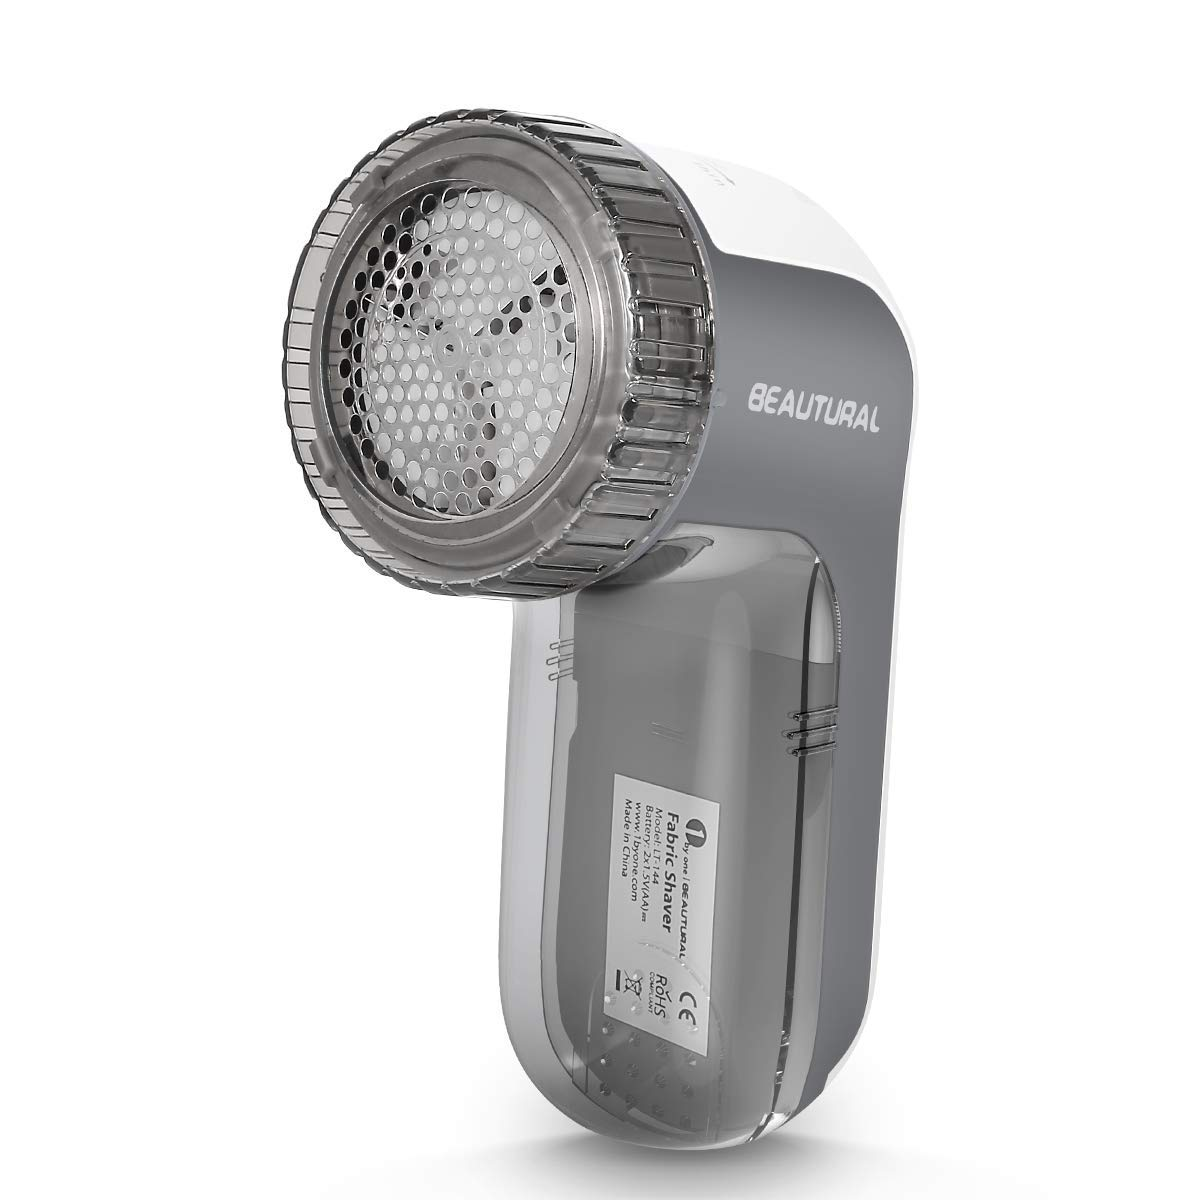 Quitapelusas eléctrico,9000R / Min, 3 alturas de afeitado,3 tamaños de agujeros